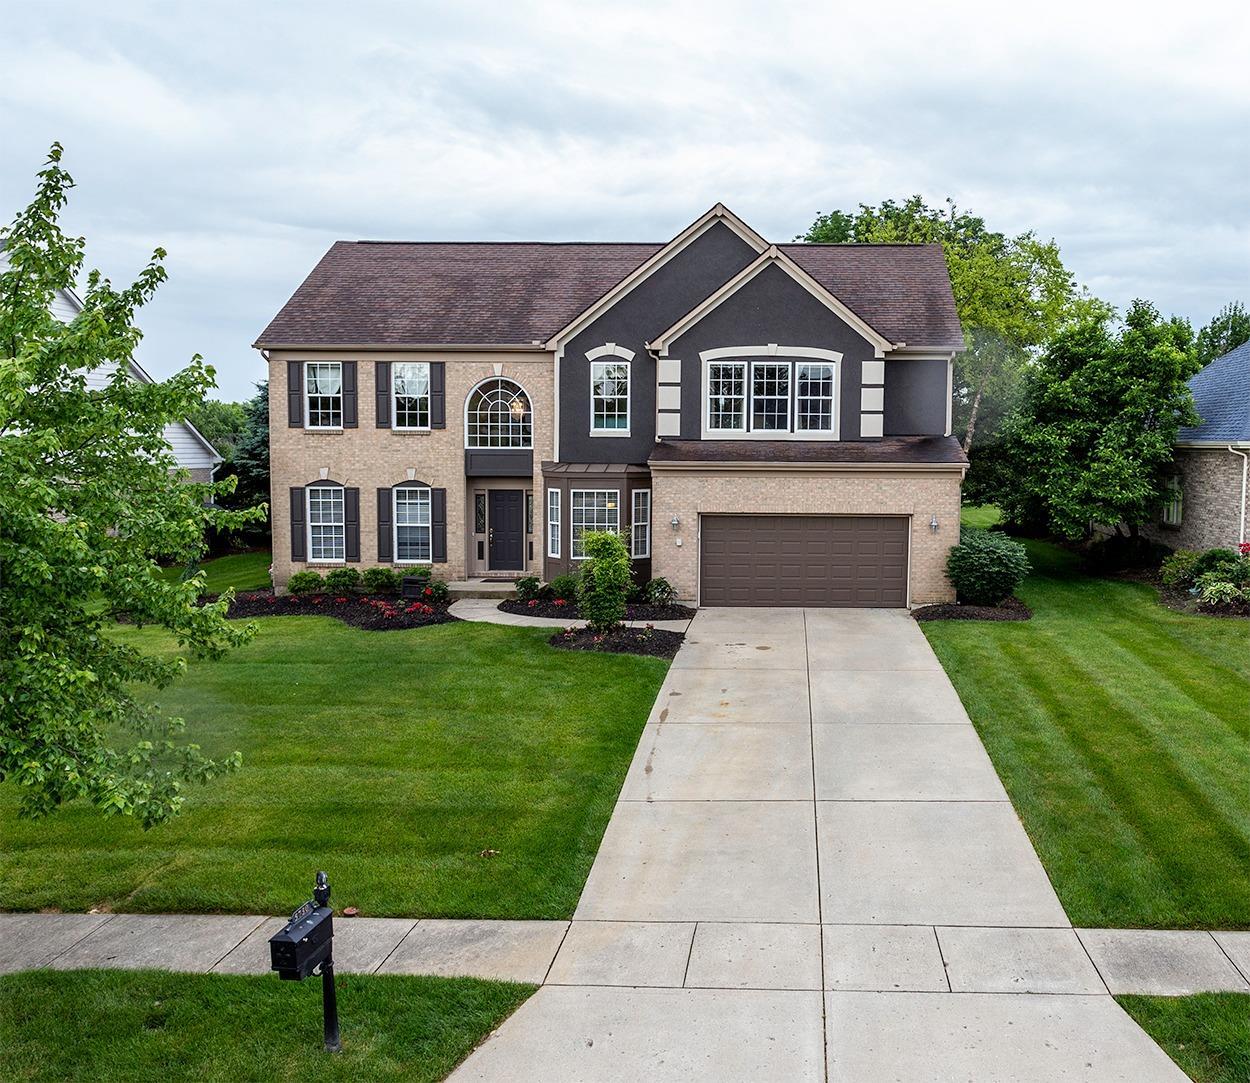 Property for sale at 5730 Fairway Drive, Mason,  Ohio 45040